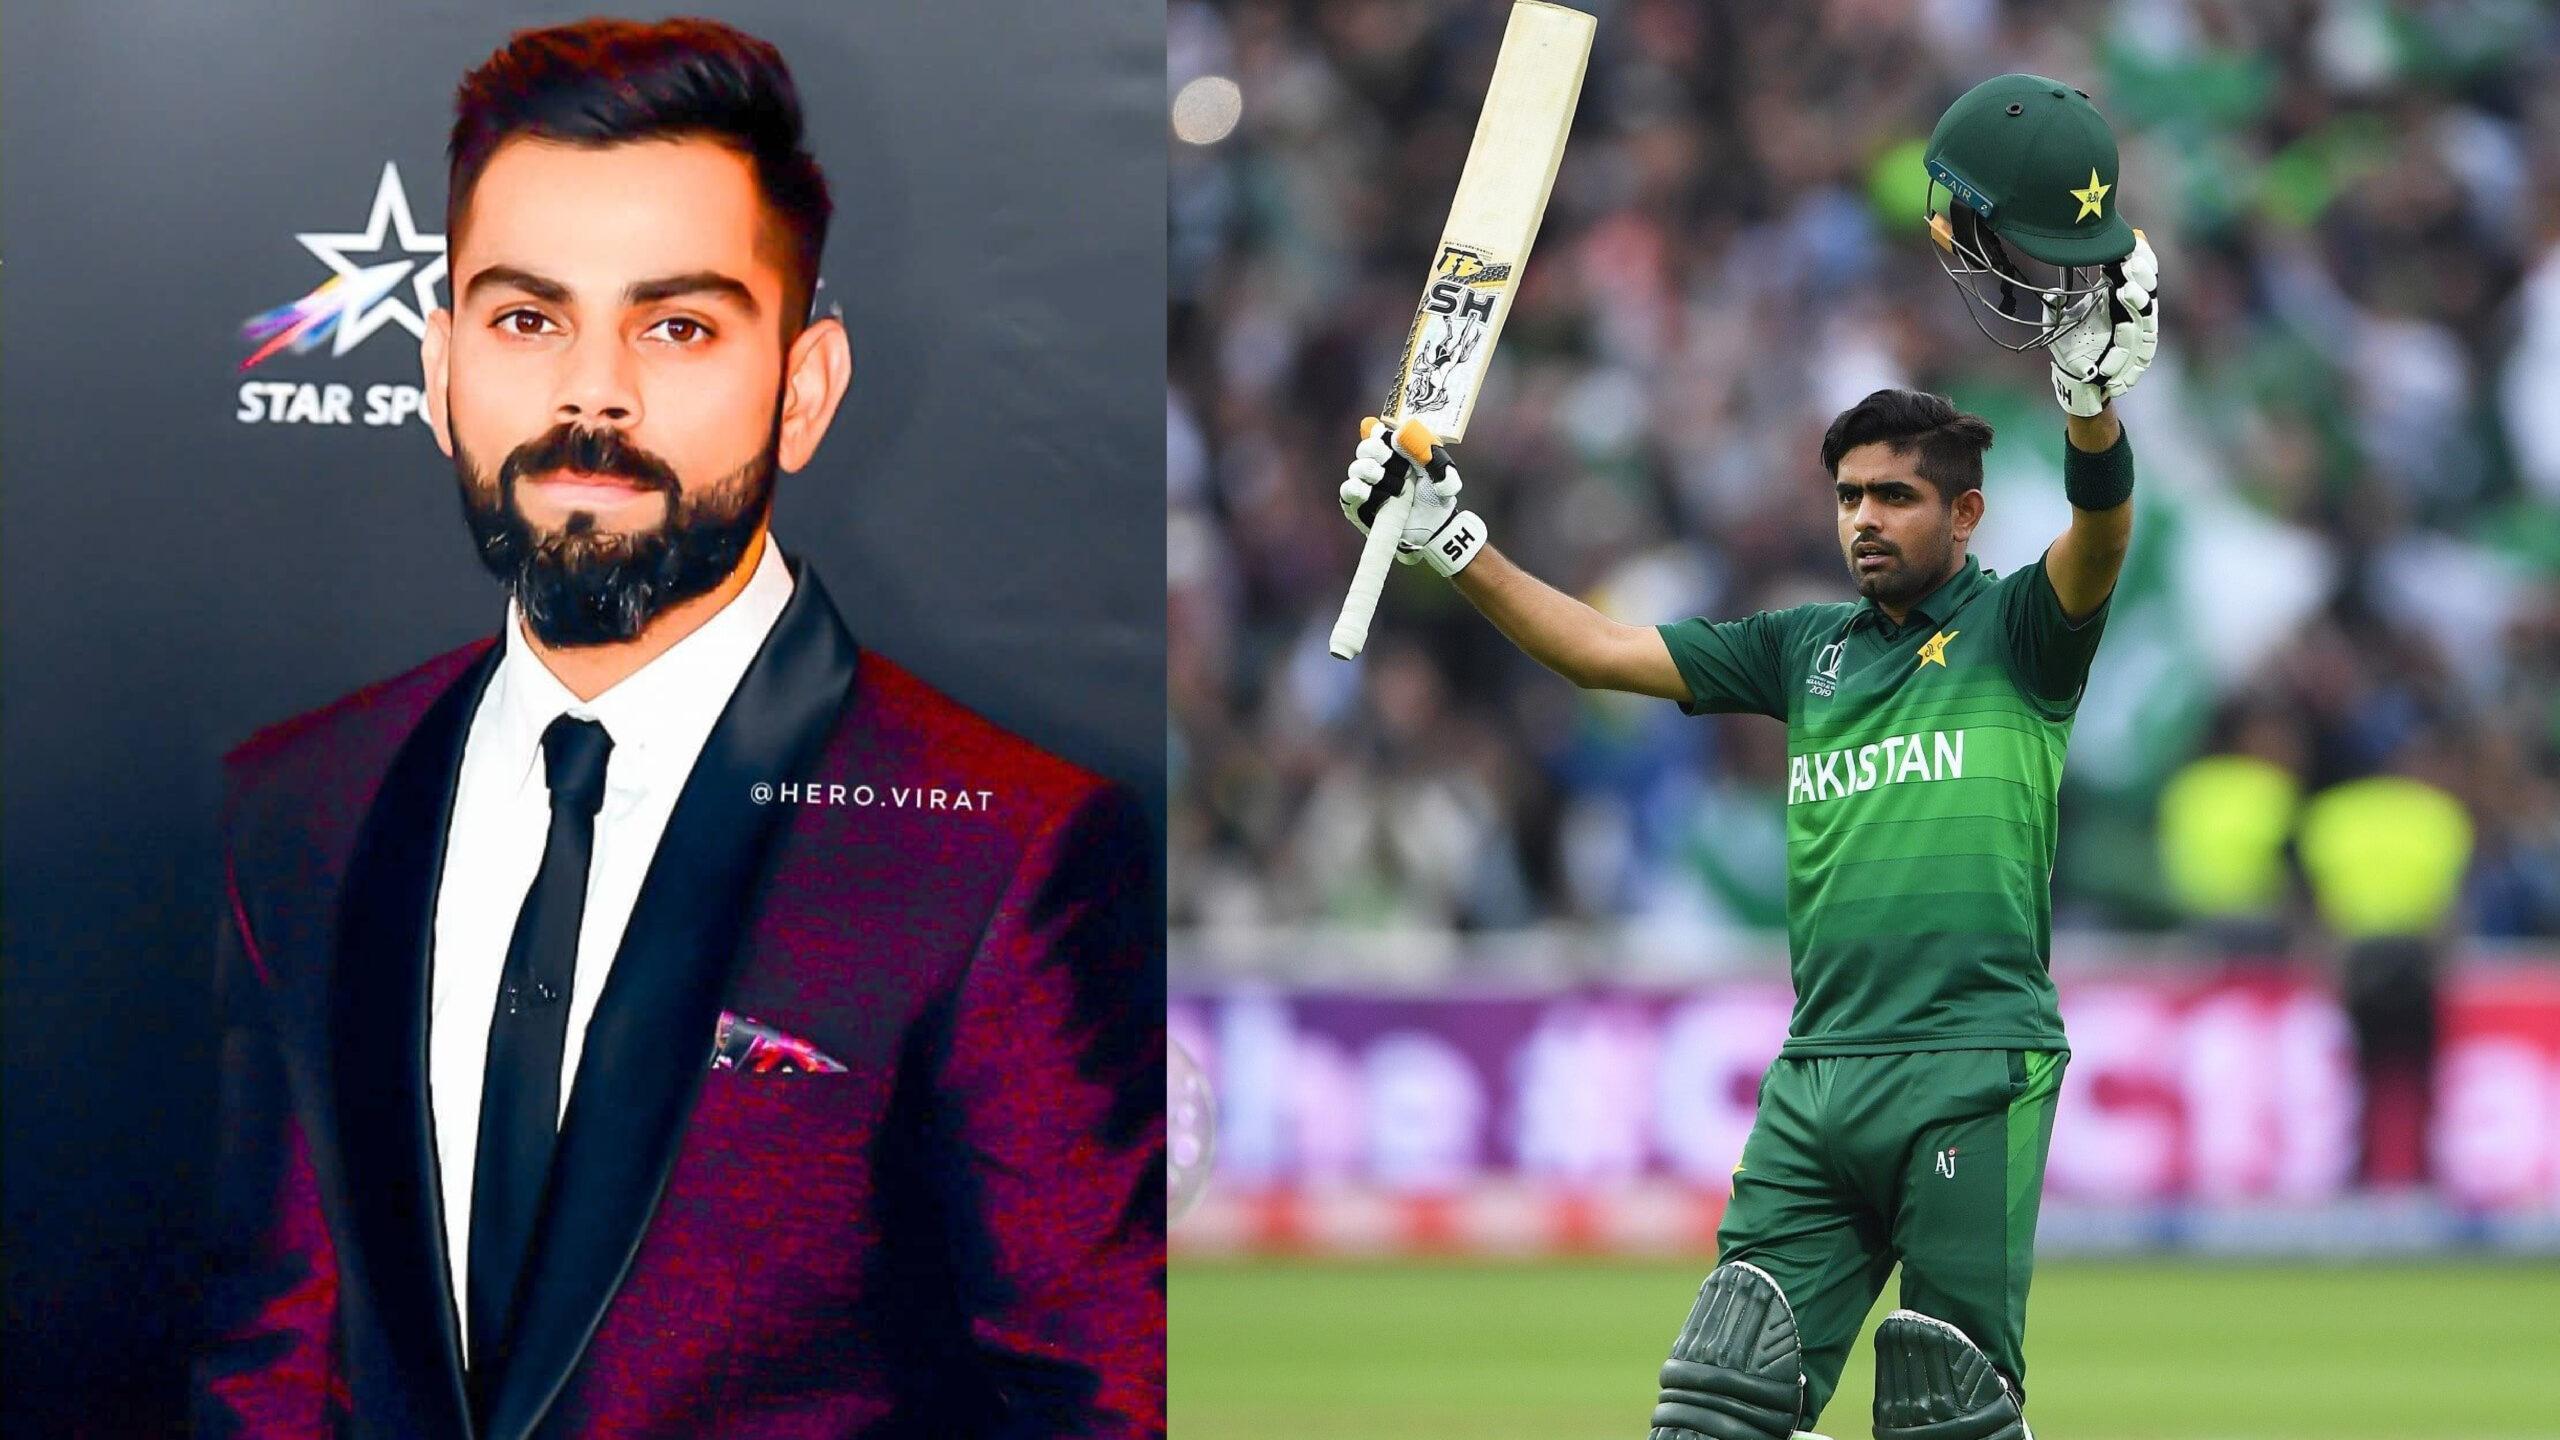 Has Babar Azam dethroned Virat Kohli on ICC rankings_